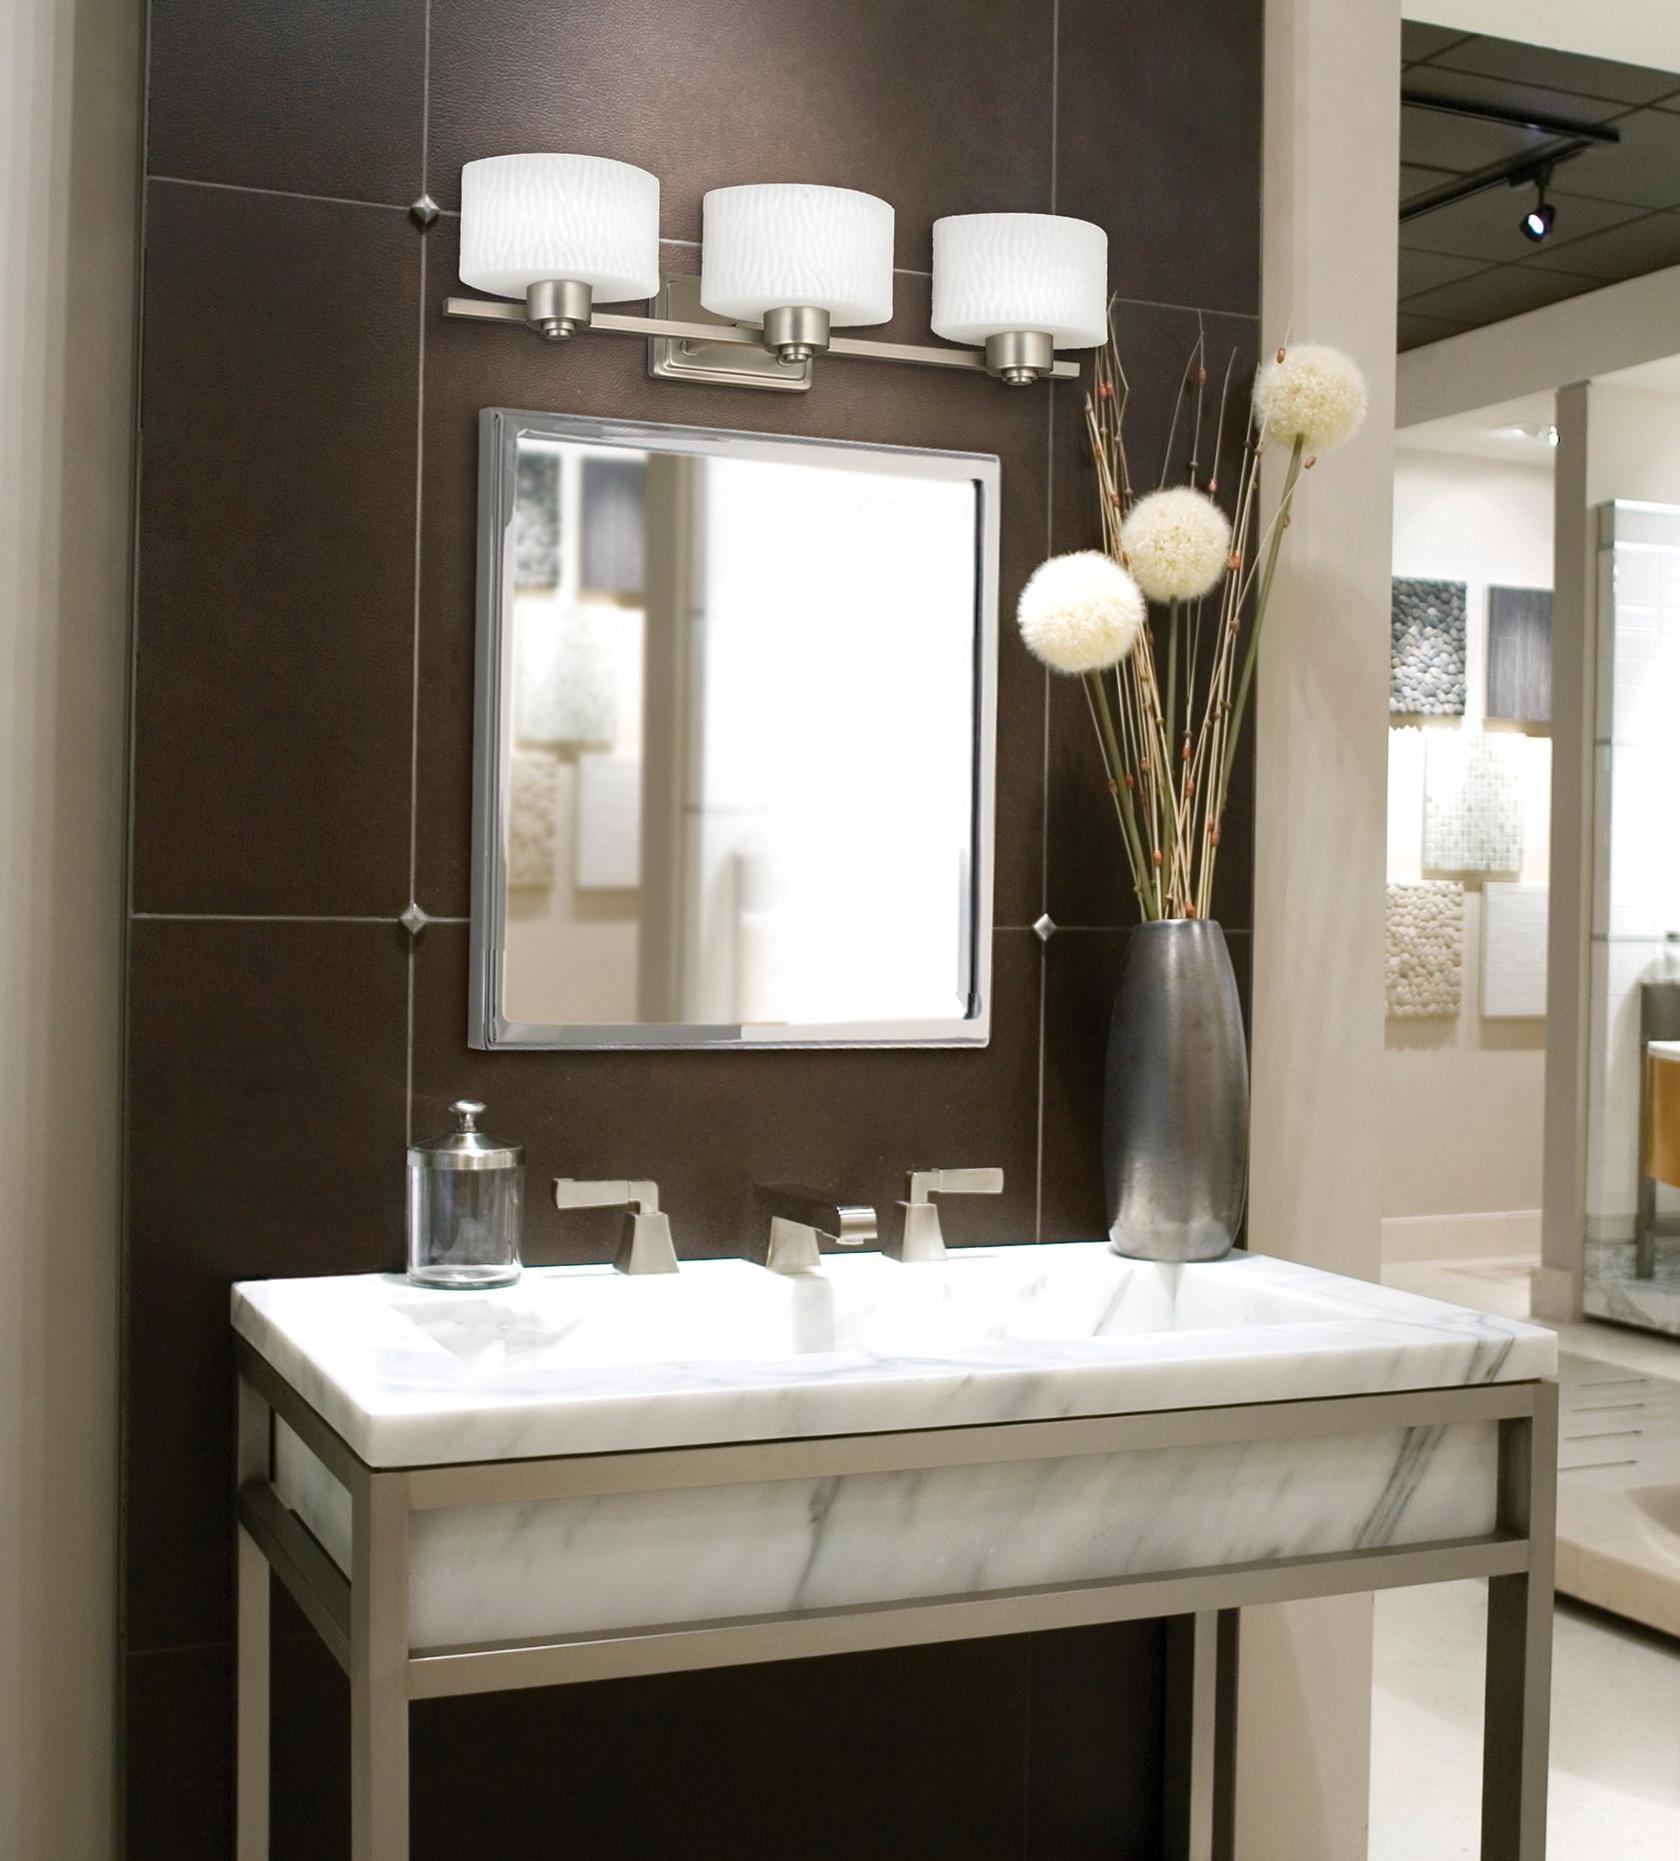 Bathroom Vanity Mirrors Hivi Design Bathroom Vanity Mirrors Pertaining To Small Bathroom Vanity Mirrors (Image 11 of 20)